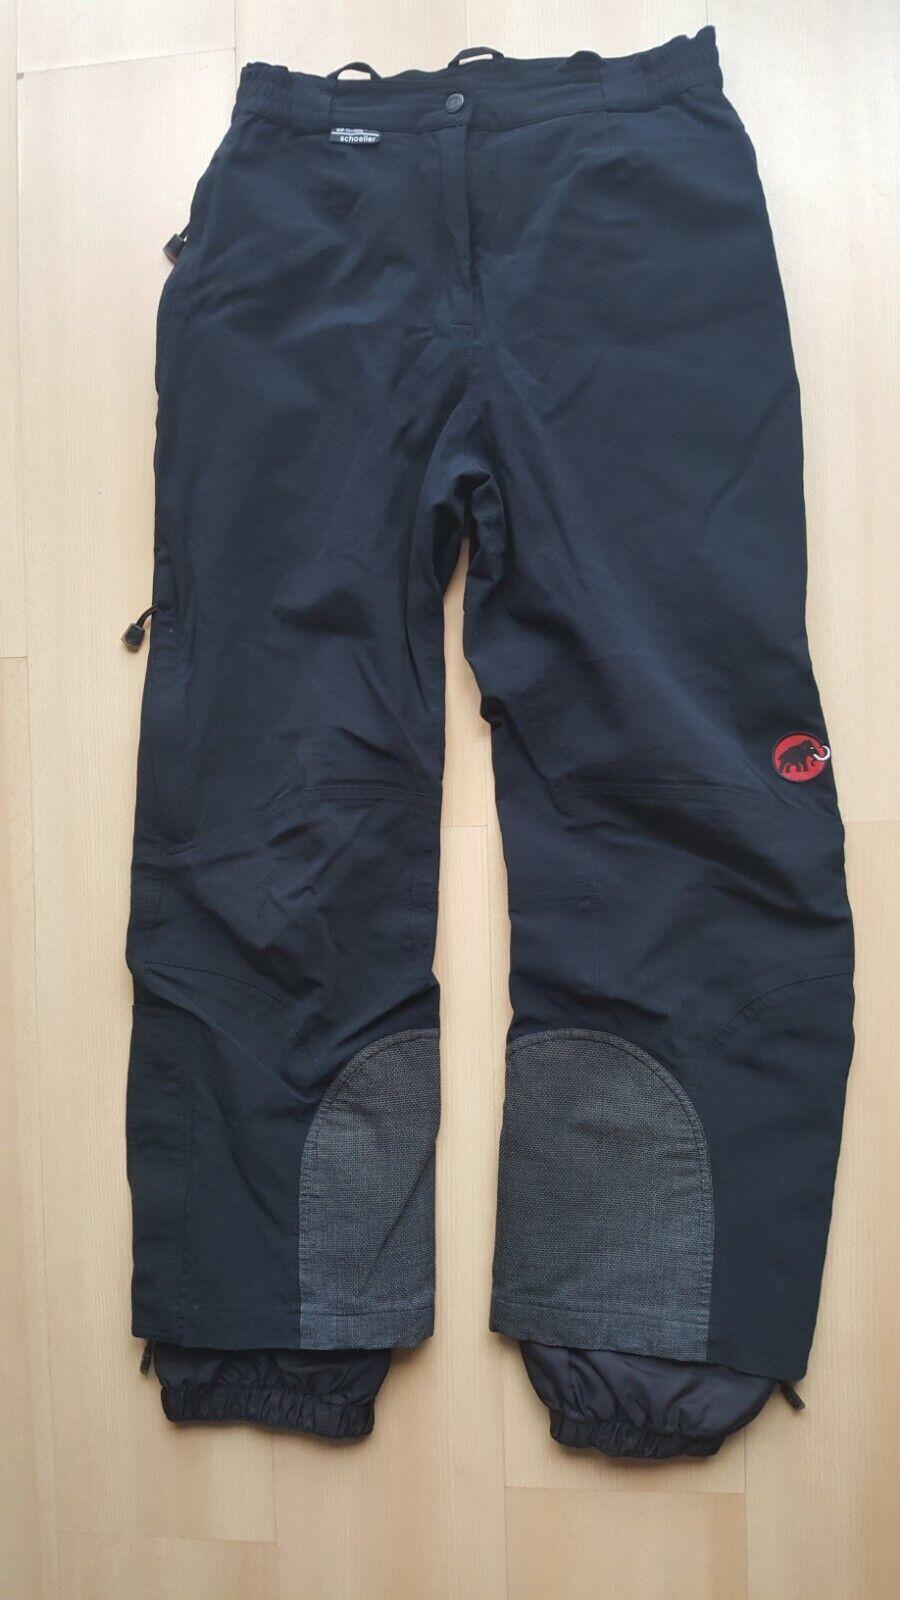 Mammut Hiking Pants Softshell Trekking Ski Schoeller Trousers Womens SIze EU40